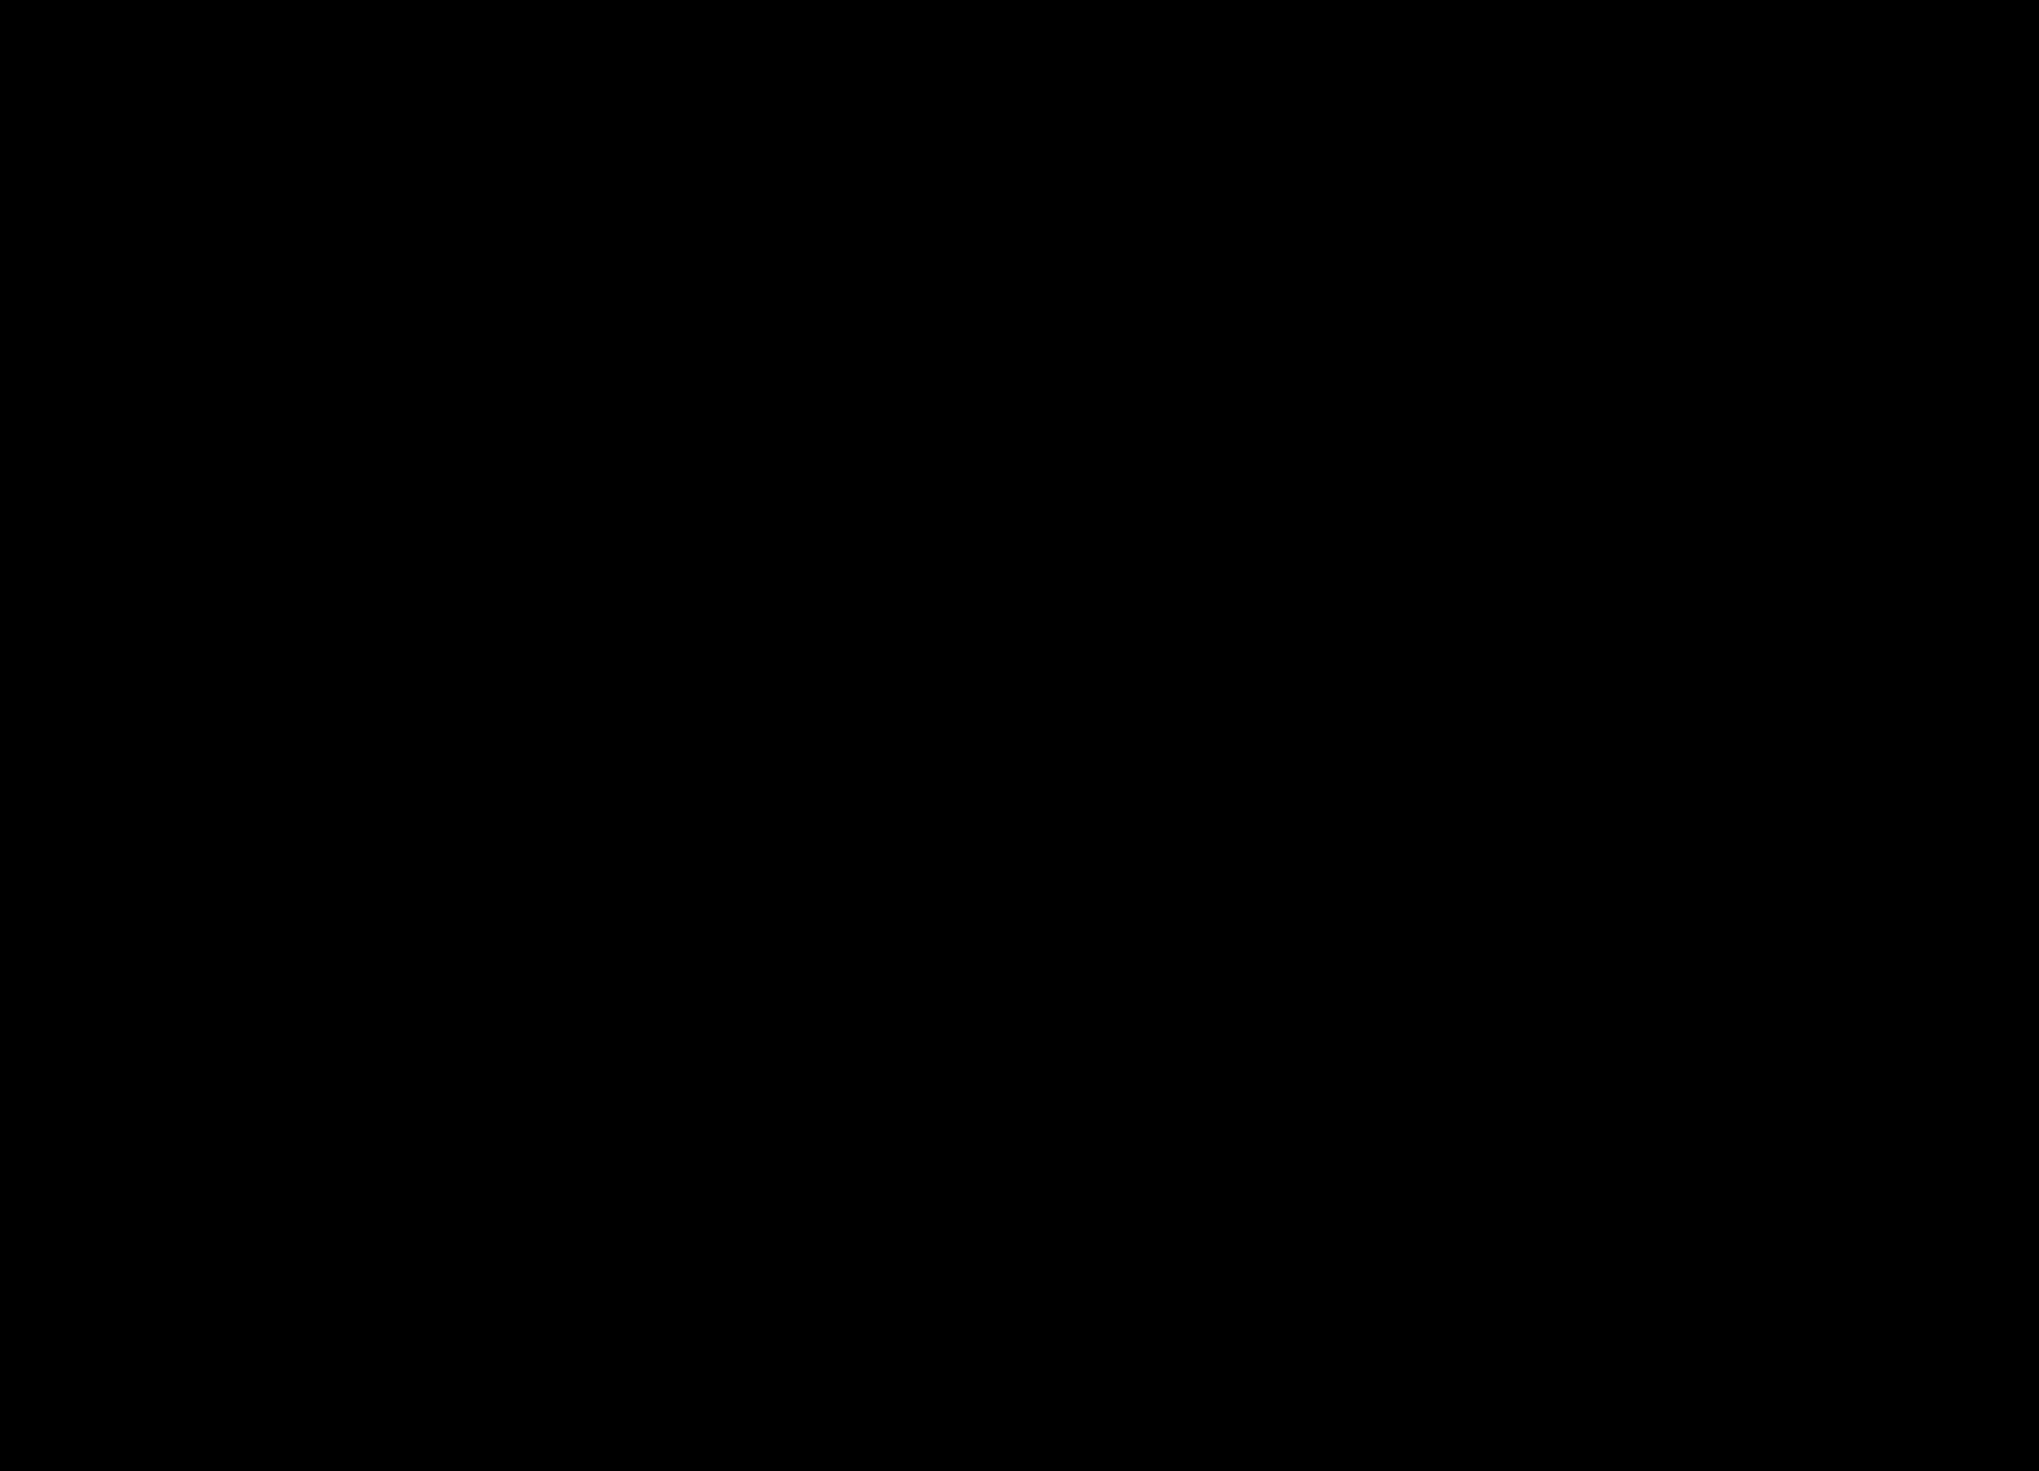 NEUTRISCI INTERNATIONAL INC. TO COMPLETE SHARE SETTLEMENT